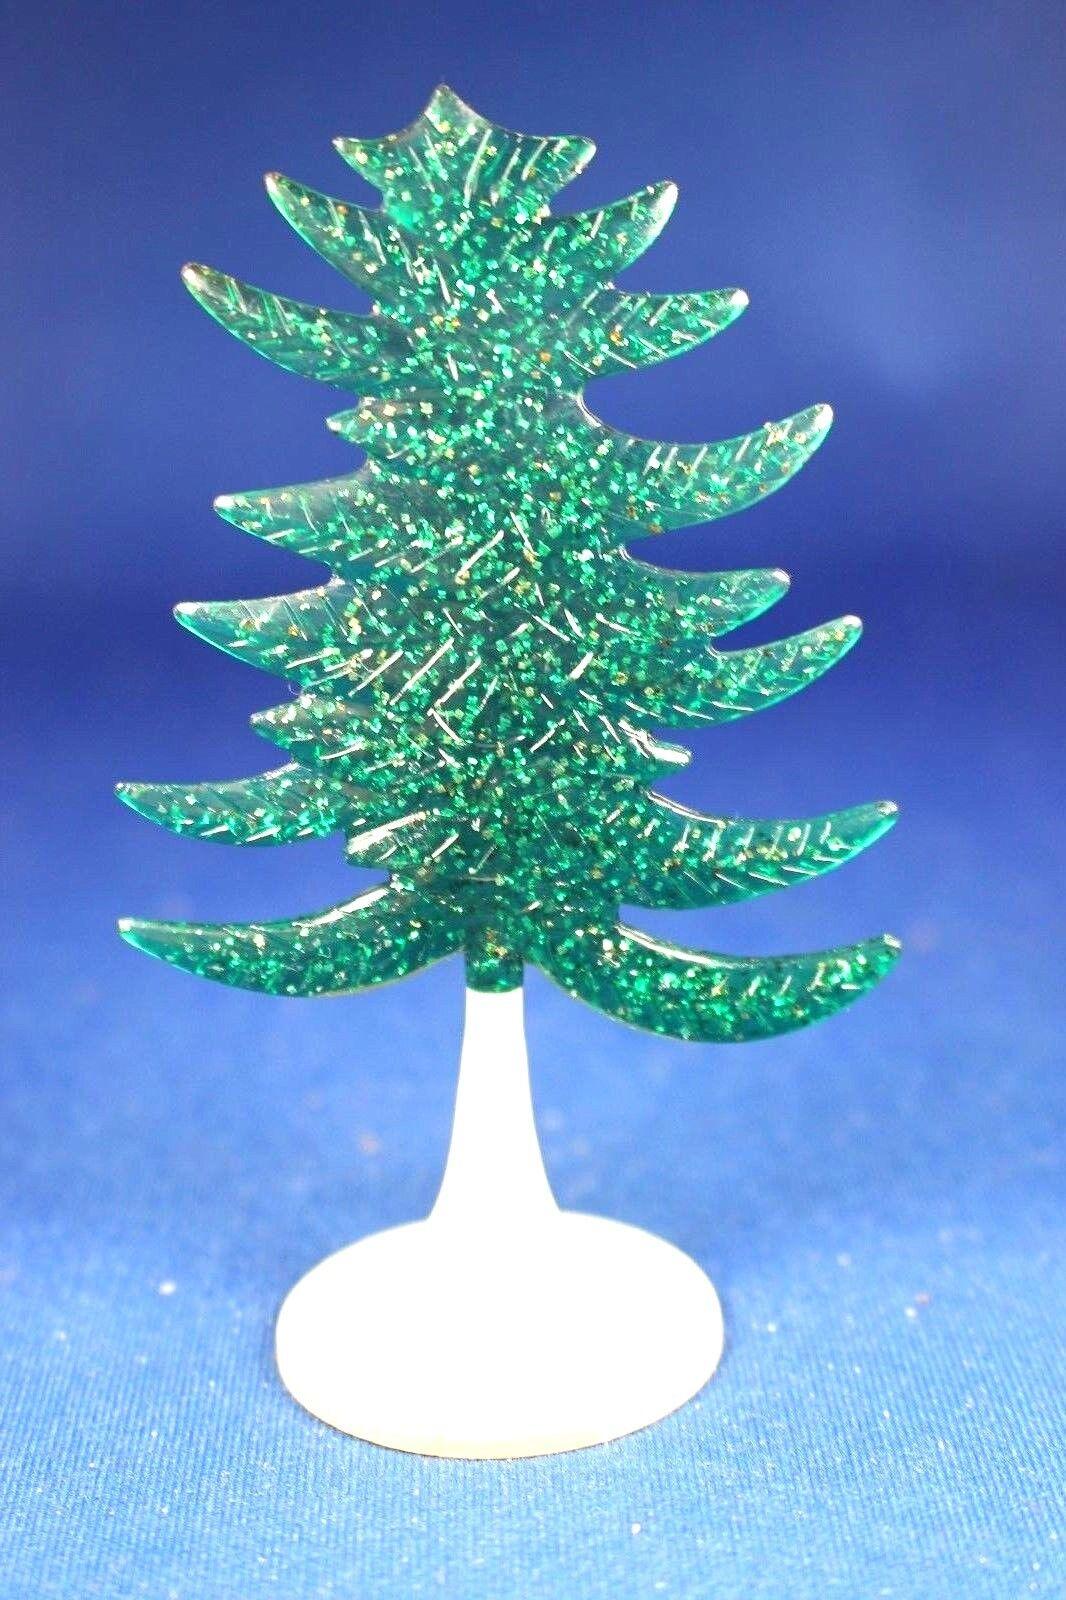 O/S - Plasticville -  CT-6 Translucent verde Eververde Tree - HTF - VG Cond.